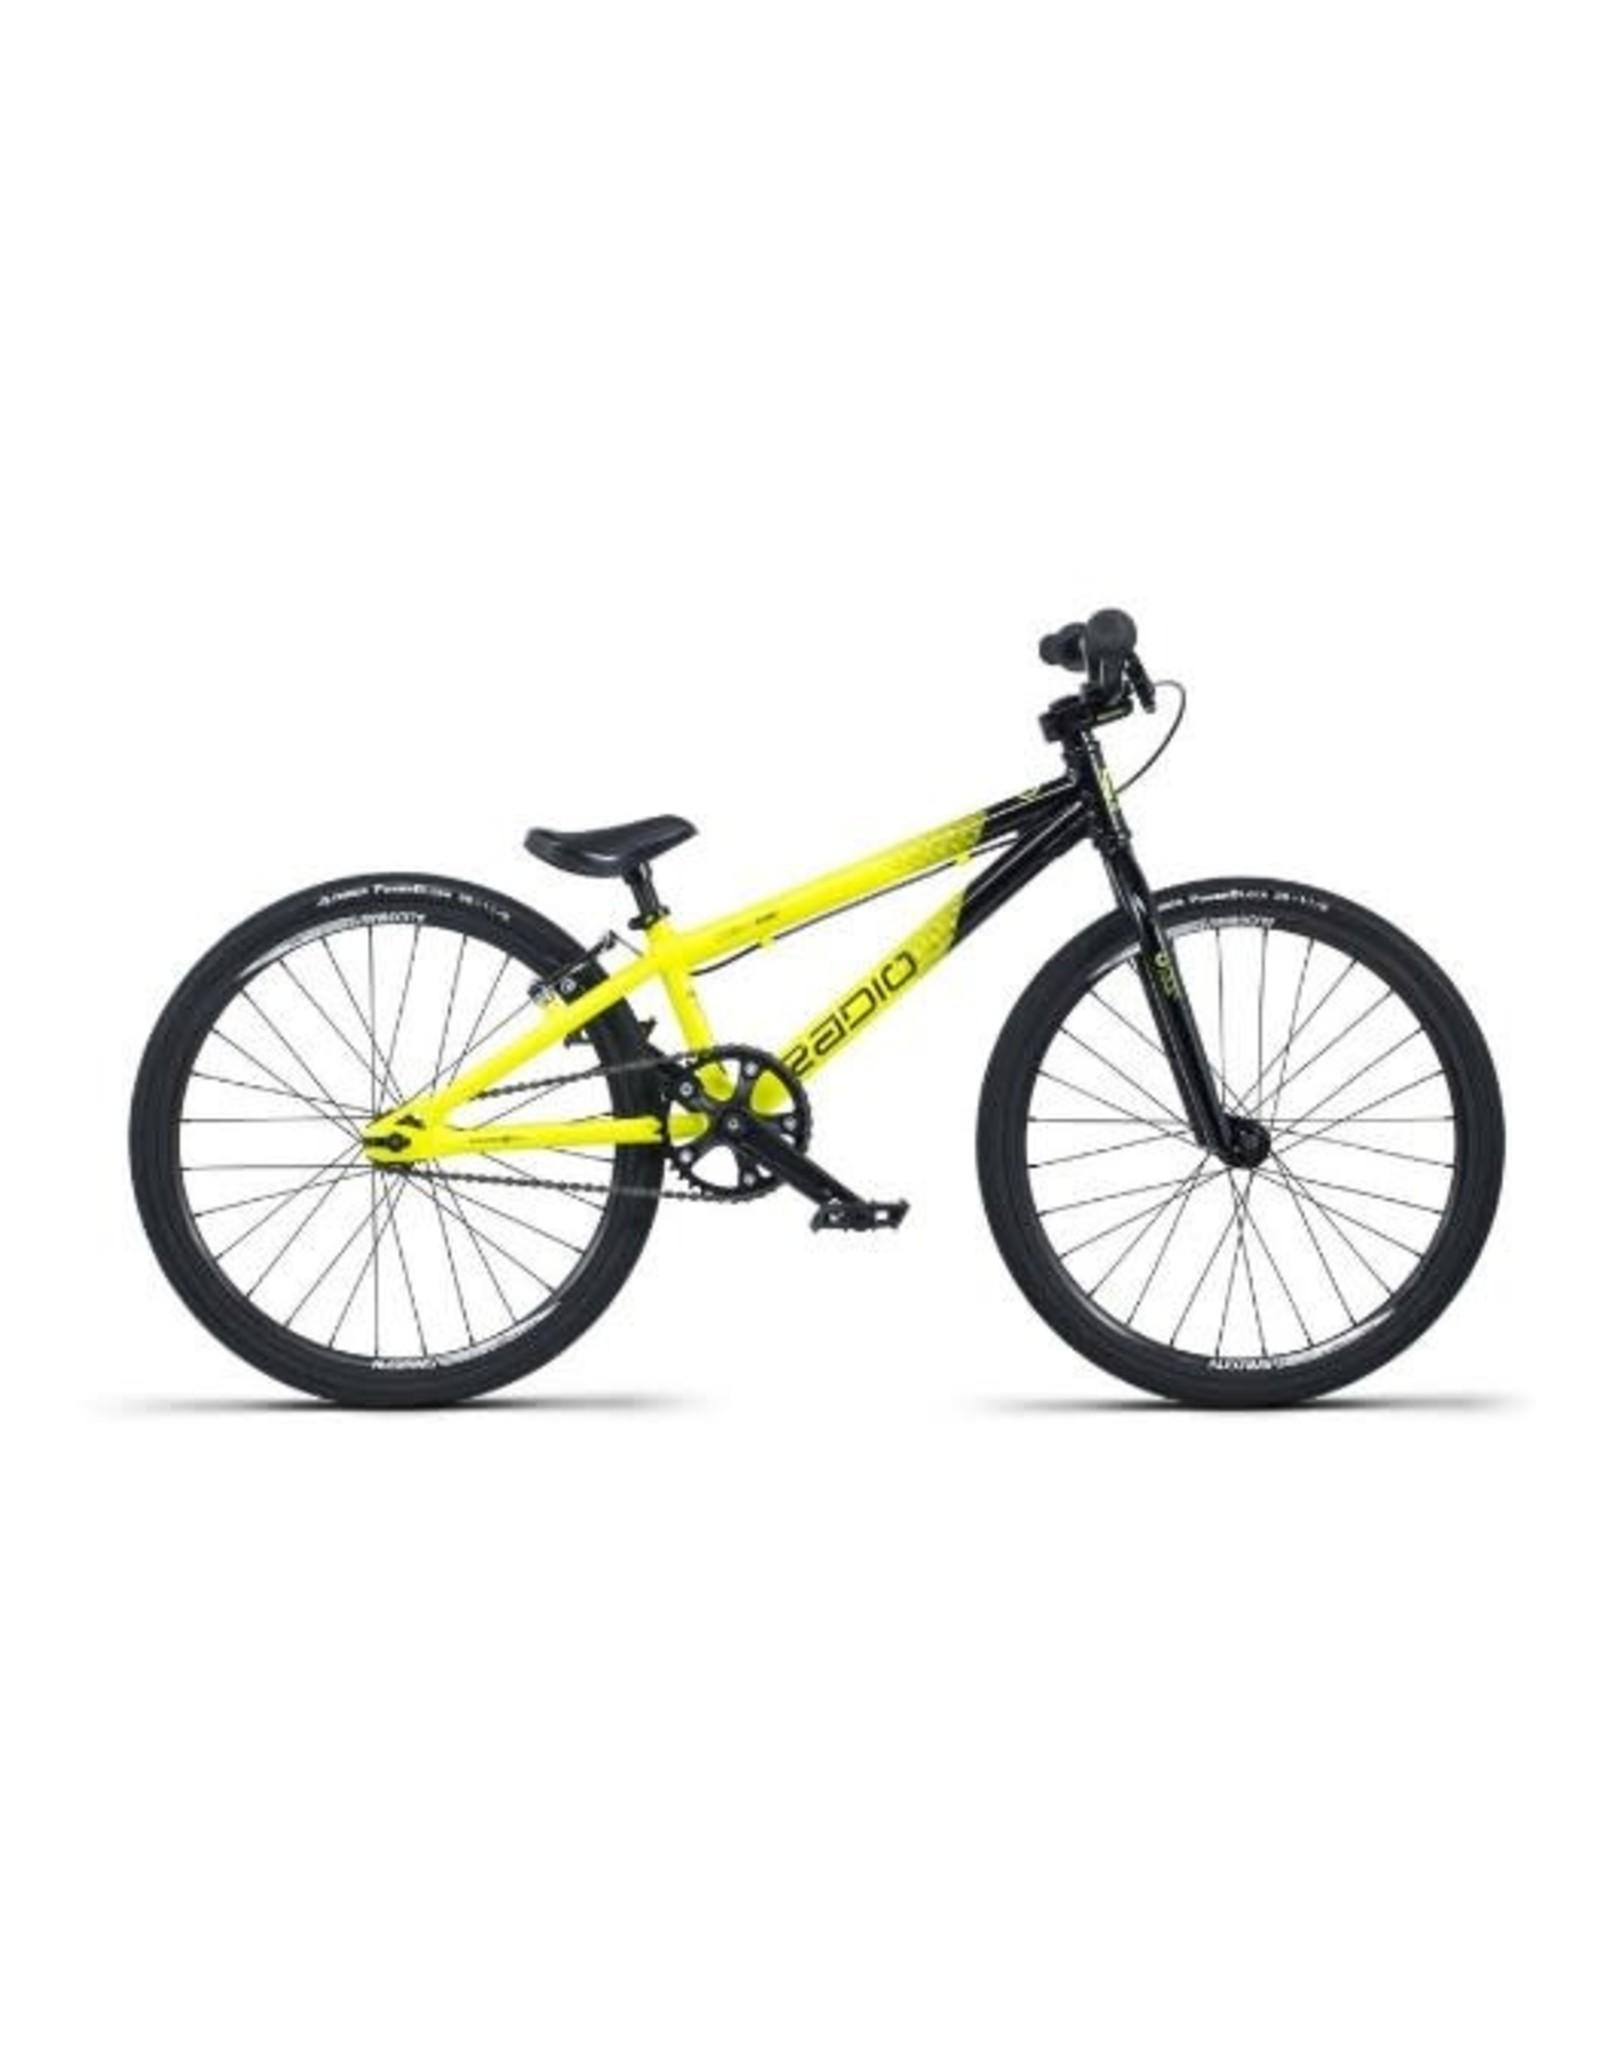 2021 Radio Race Cobalt Mini black/yellow